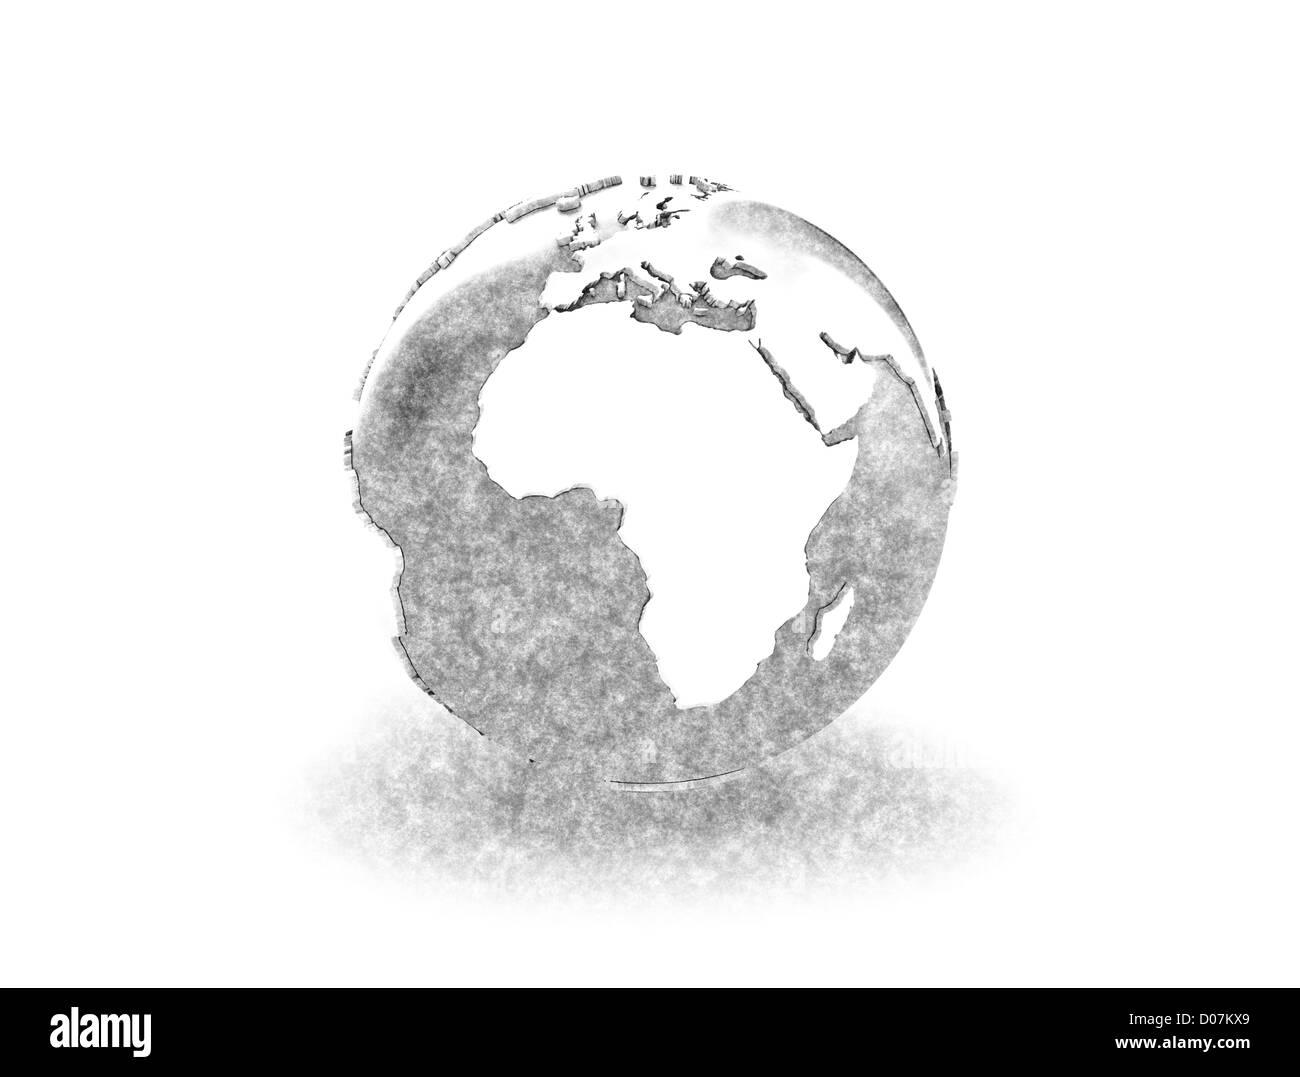 World globe pencil sketch